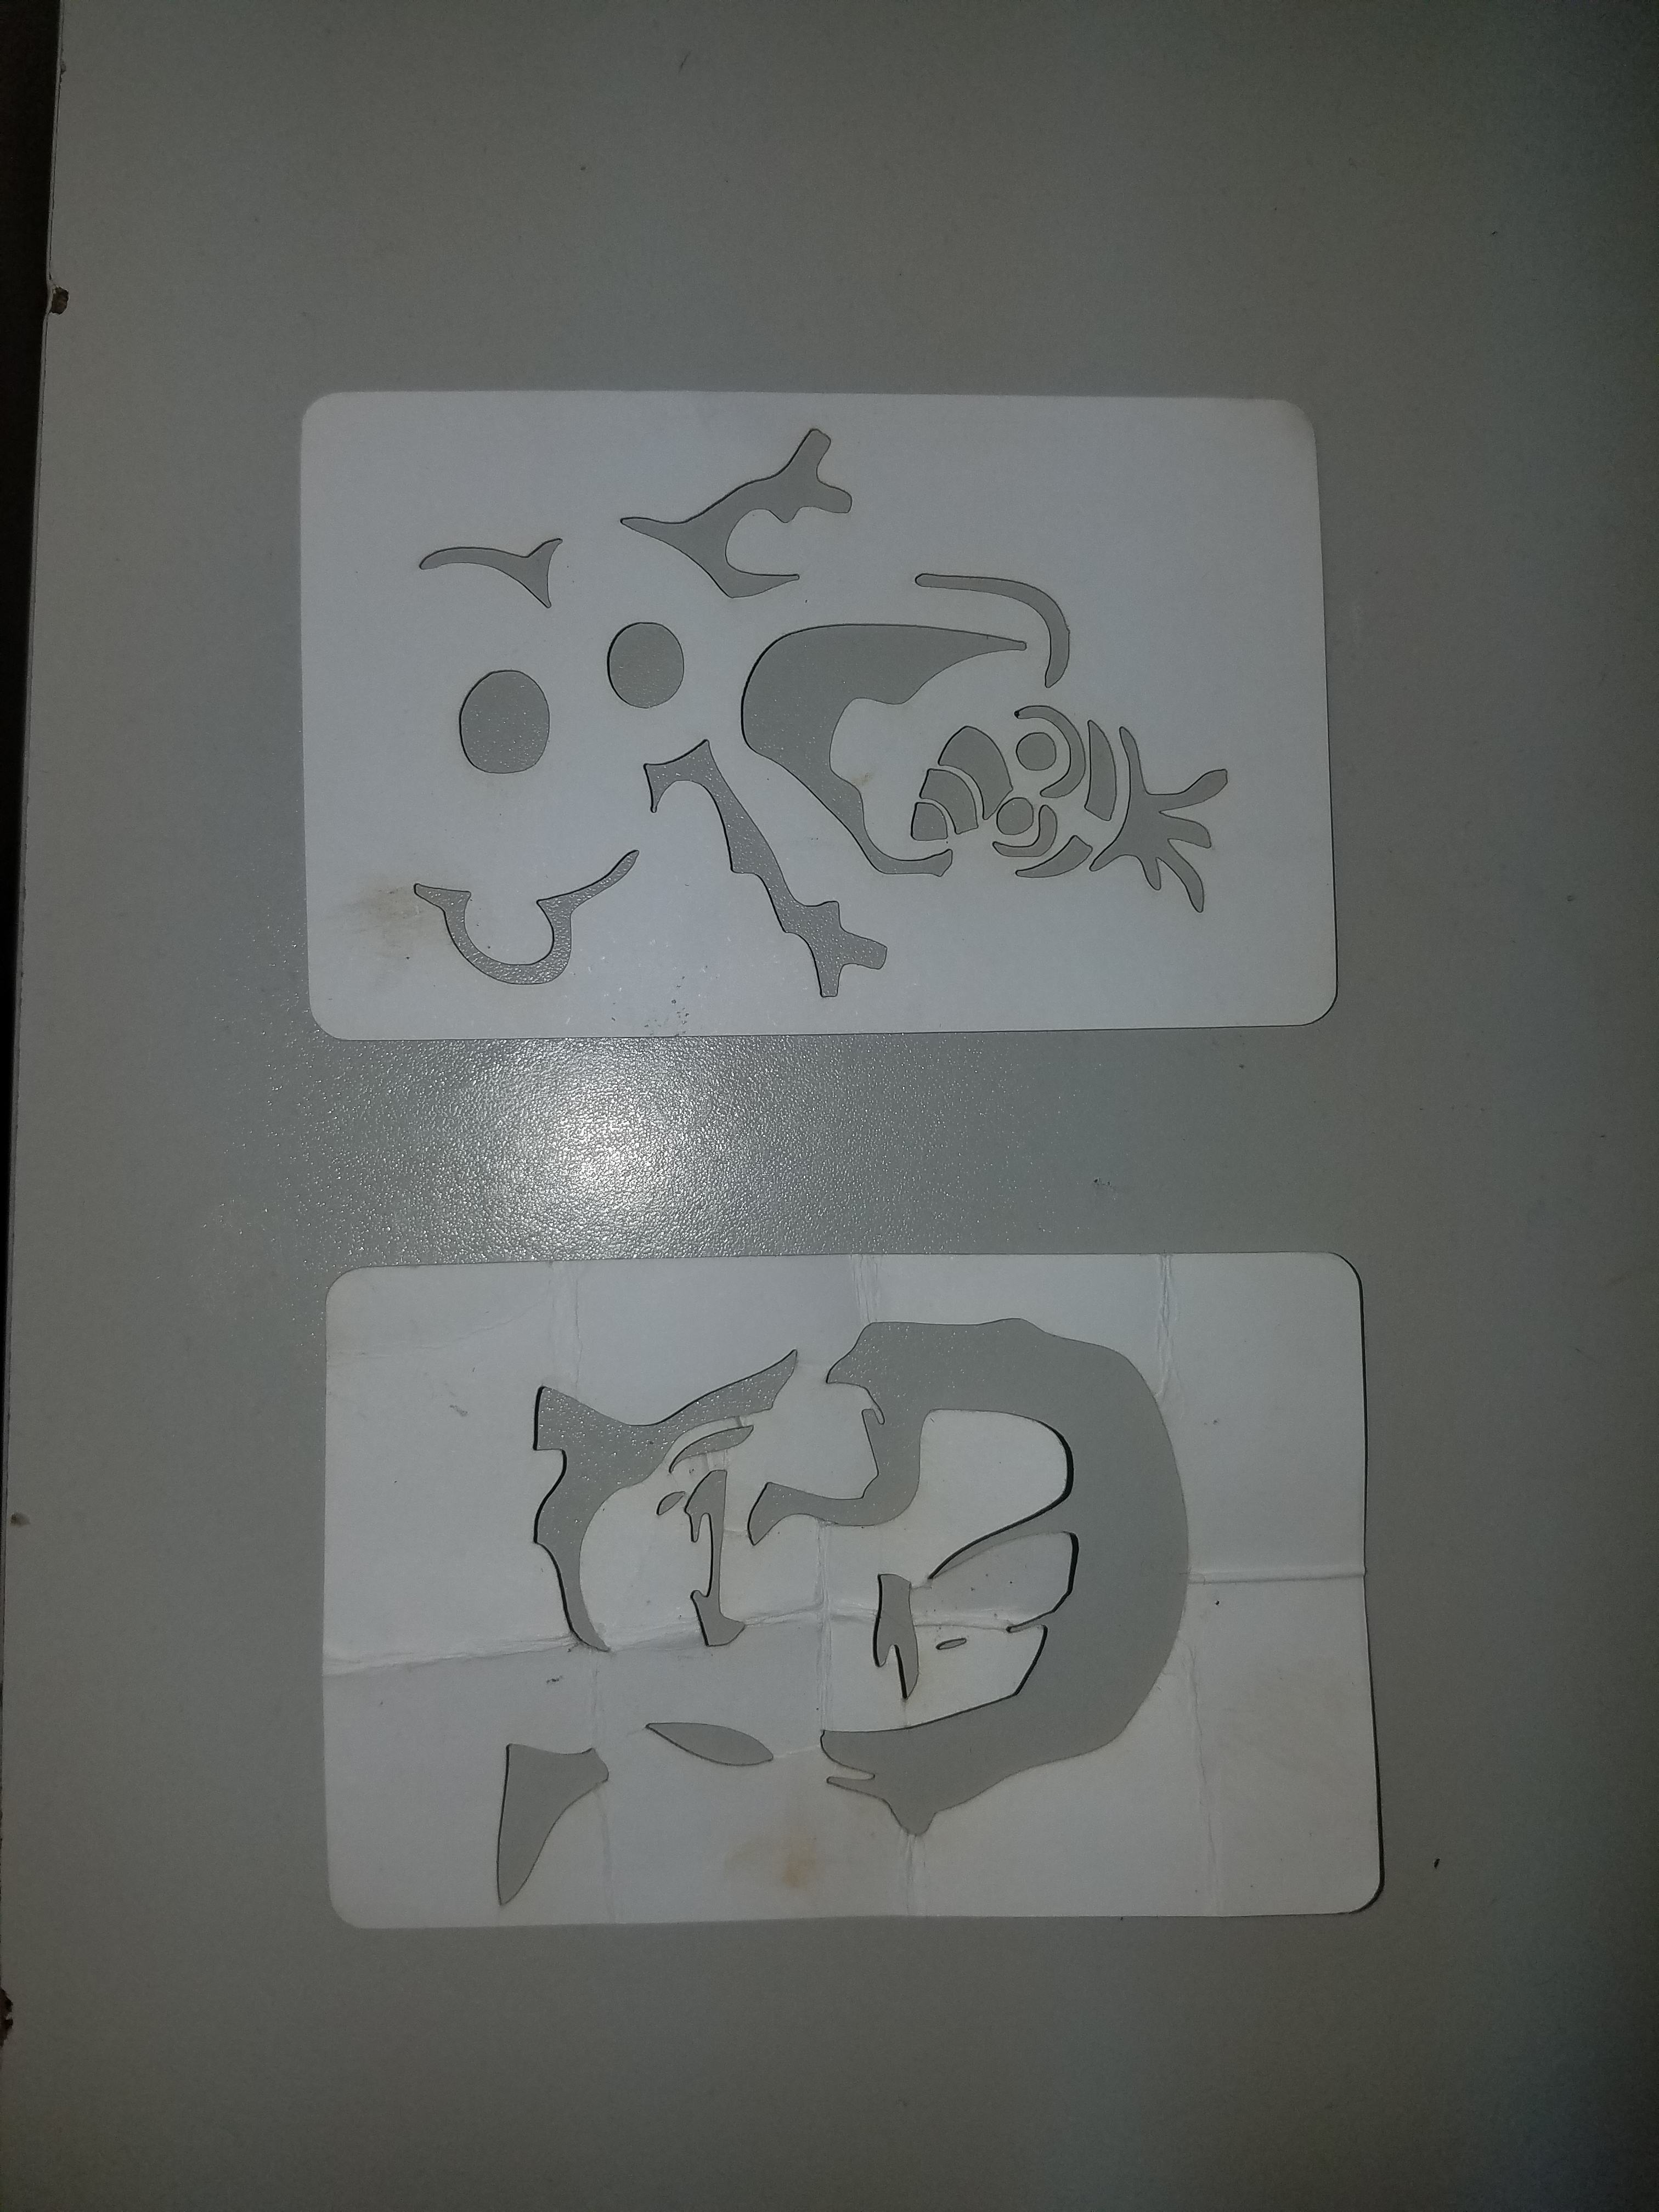 New to Cricut maker, id like to cut paper stencil design